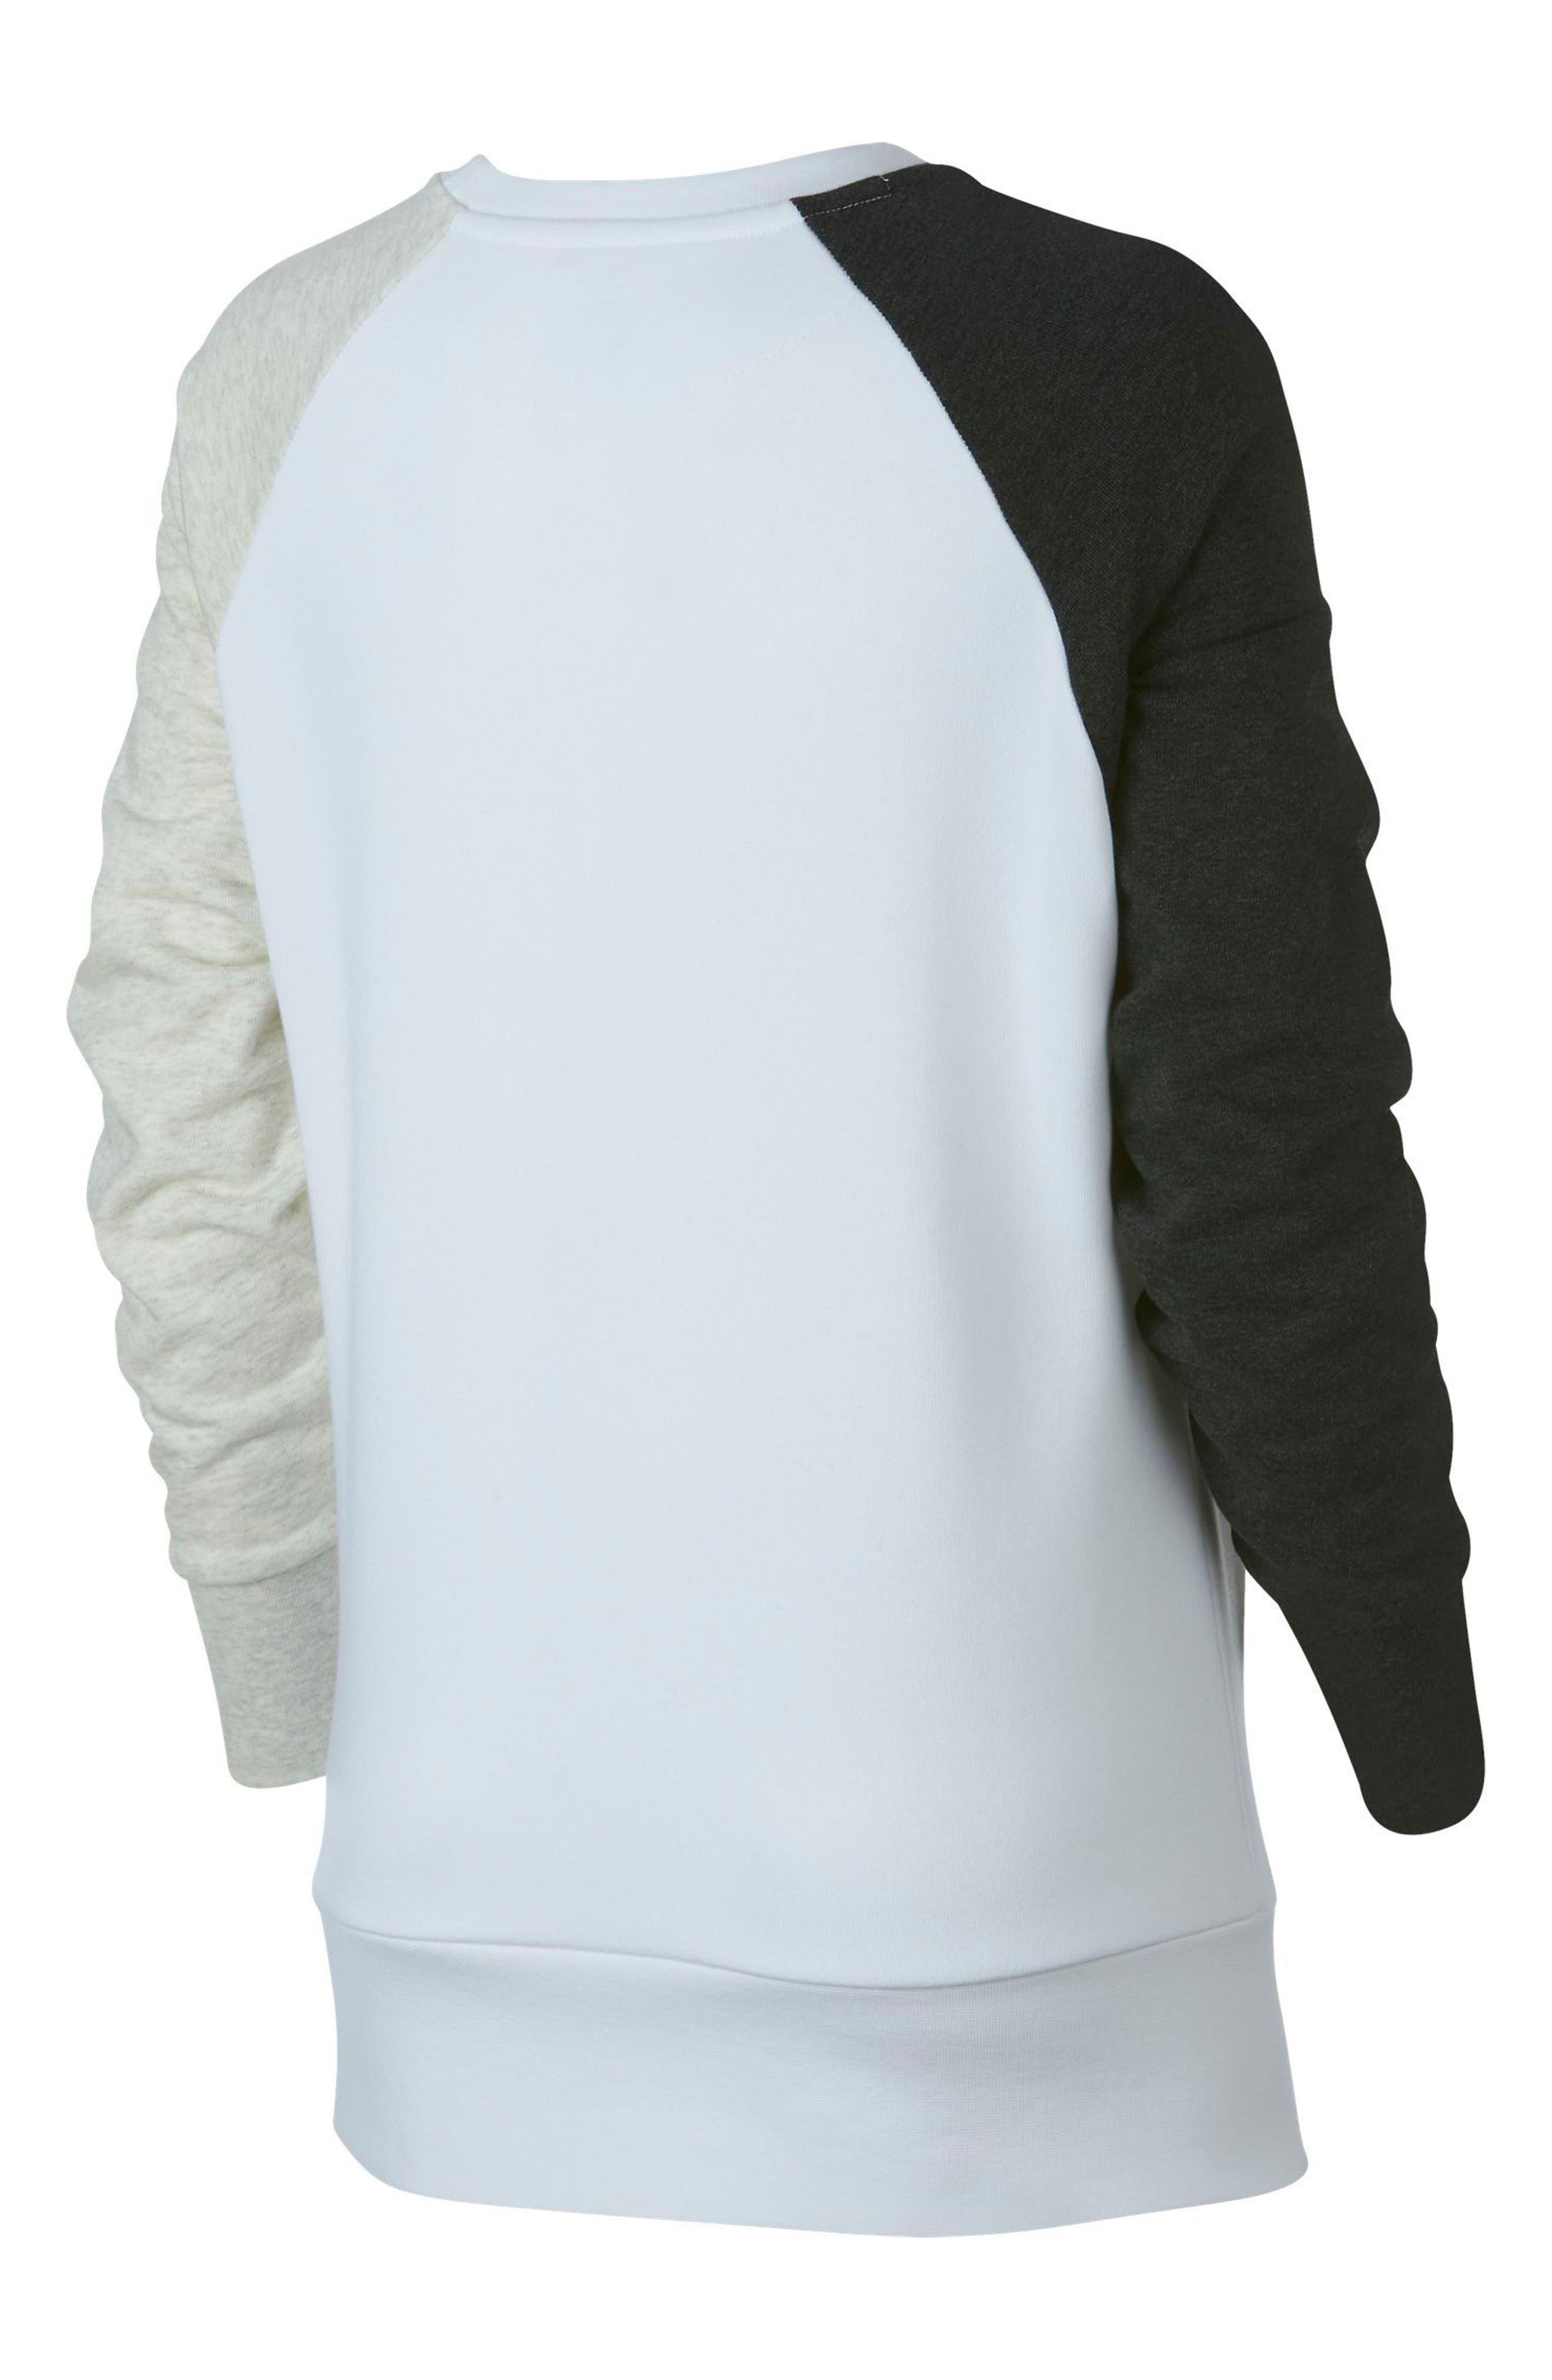 Dry Swoosh Sweatshirt,                             Alternate thumbnail 8, color,                             WHITE/ BLACK HEATHER/ WHITE